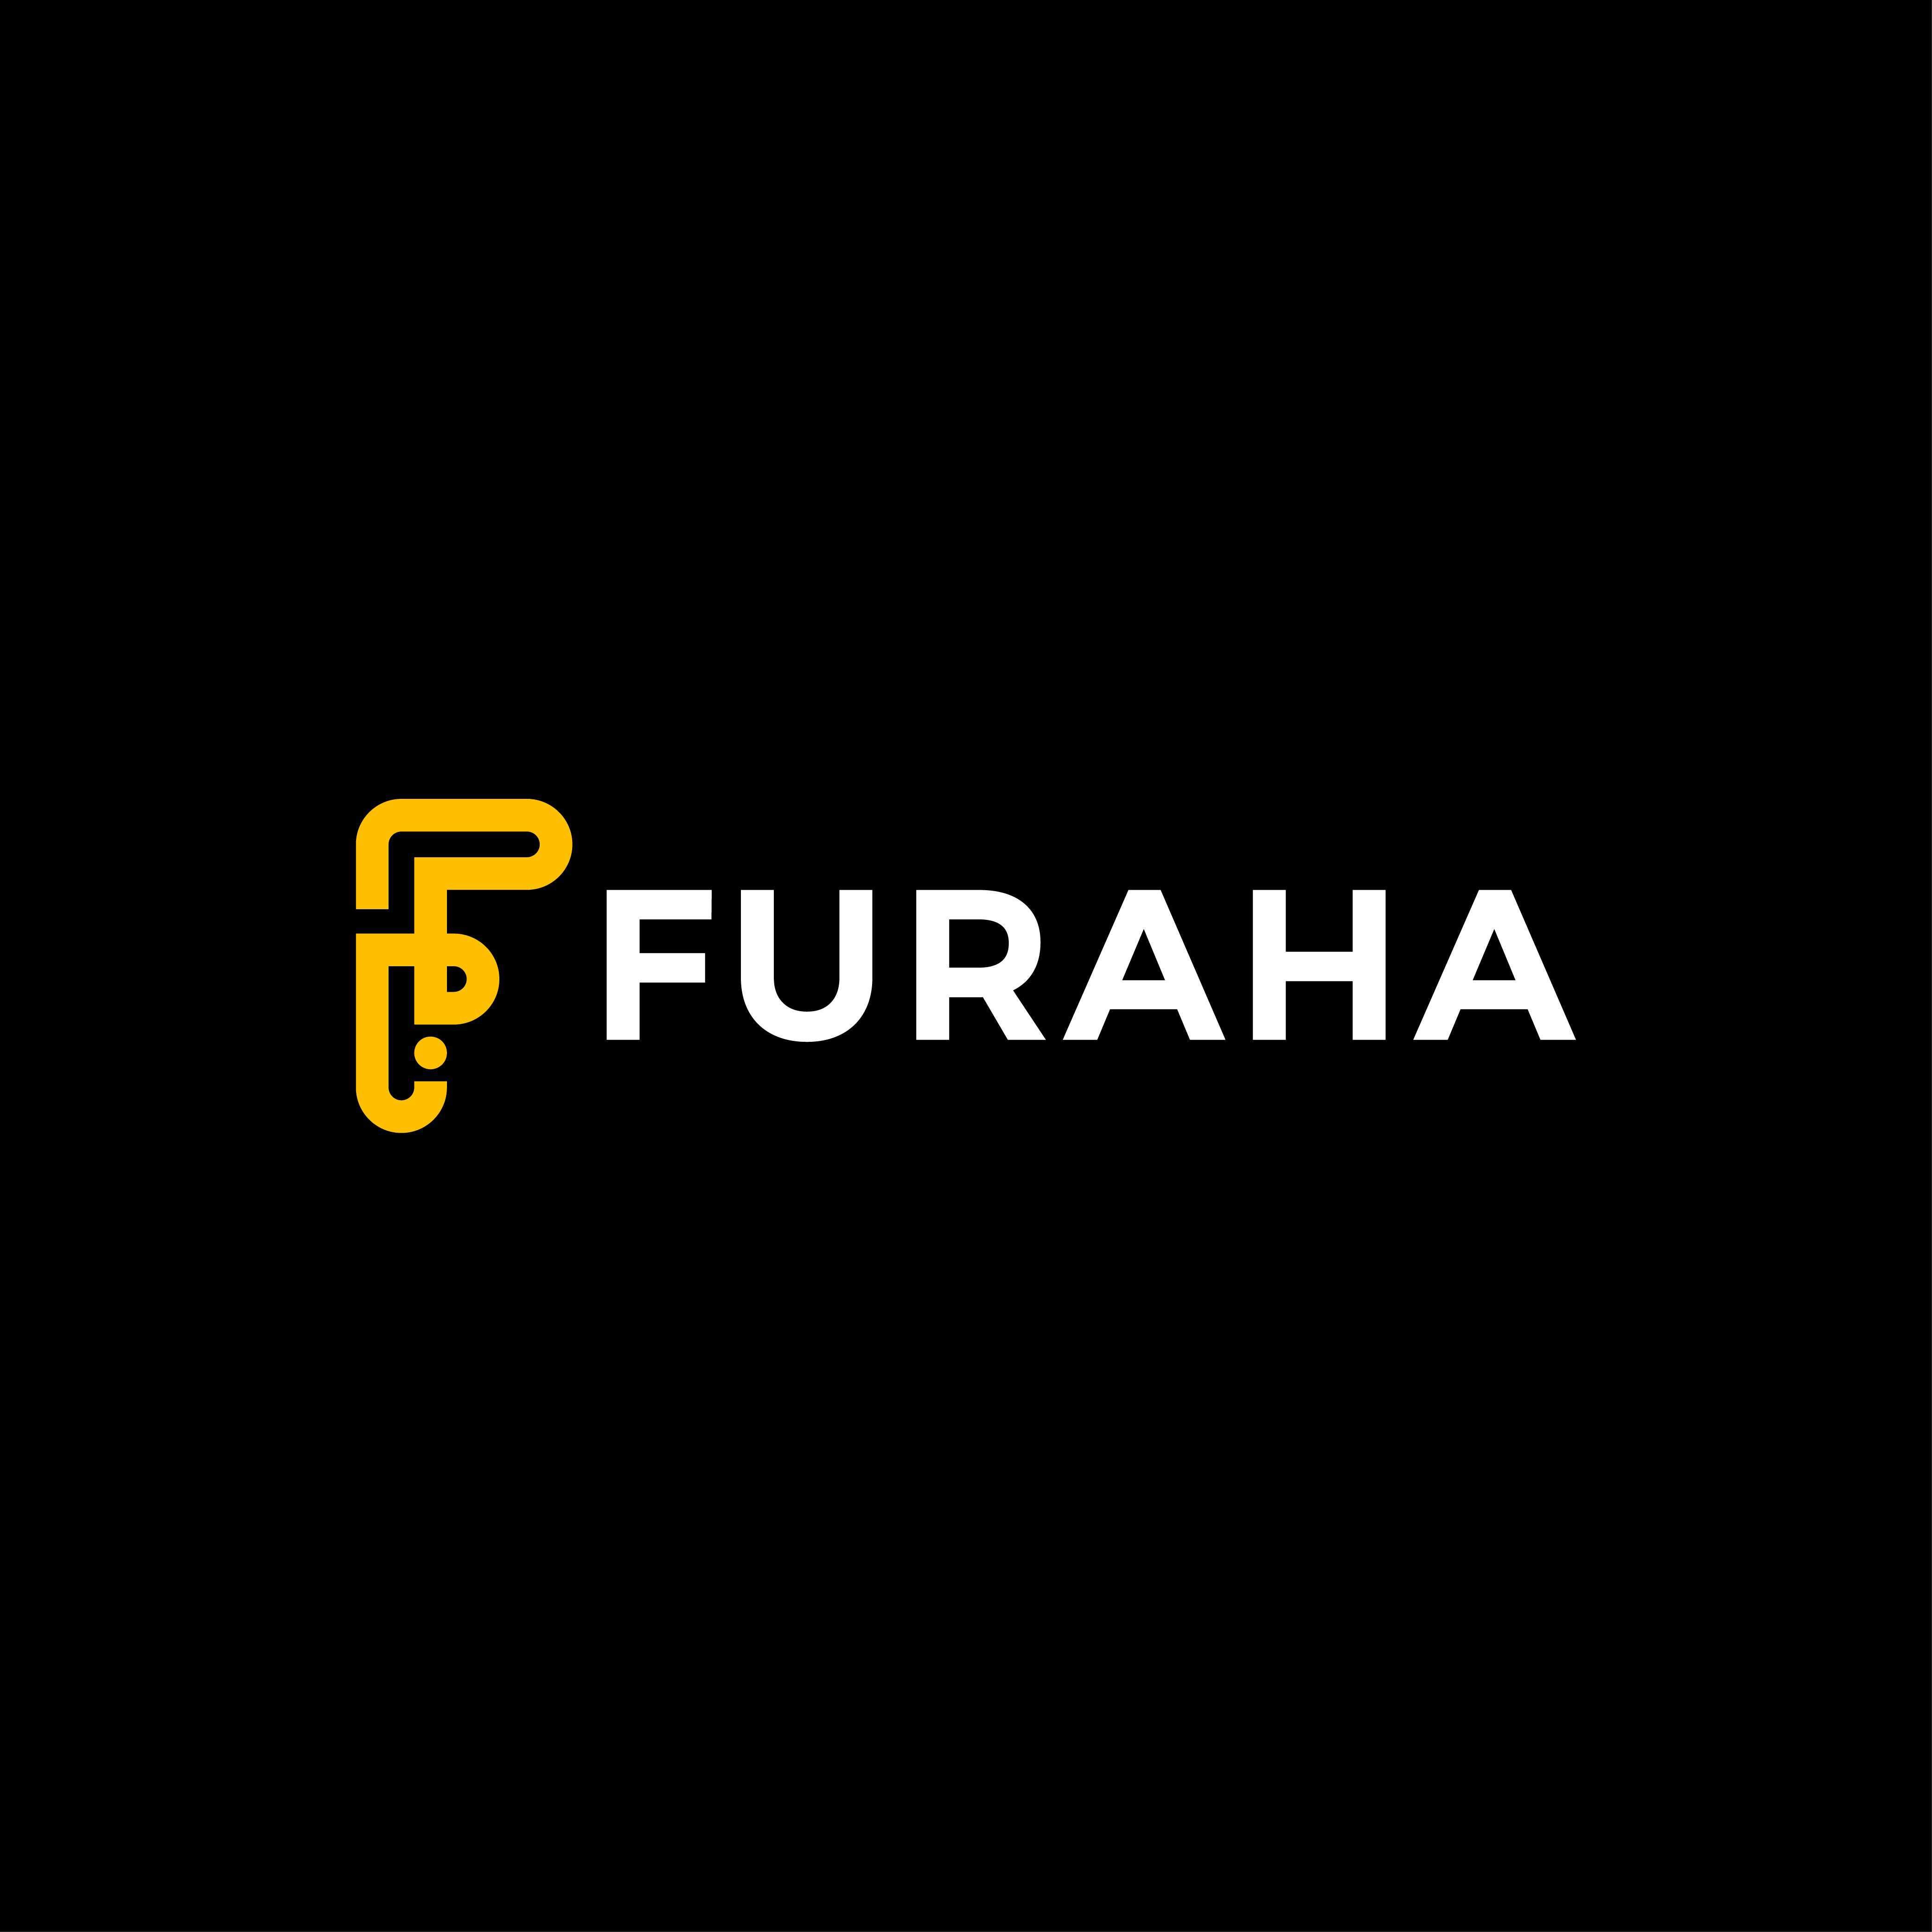 Furaha-White